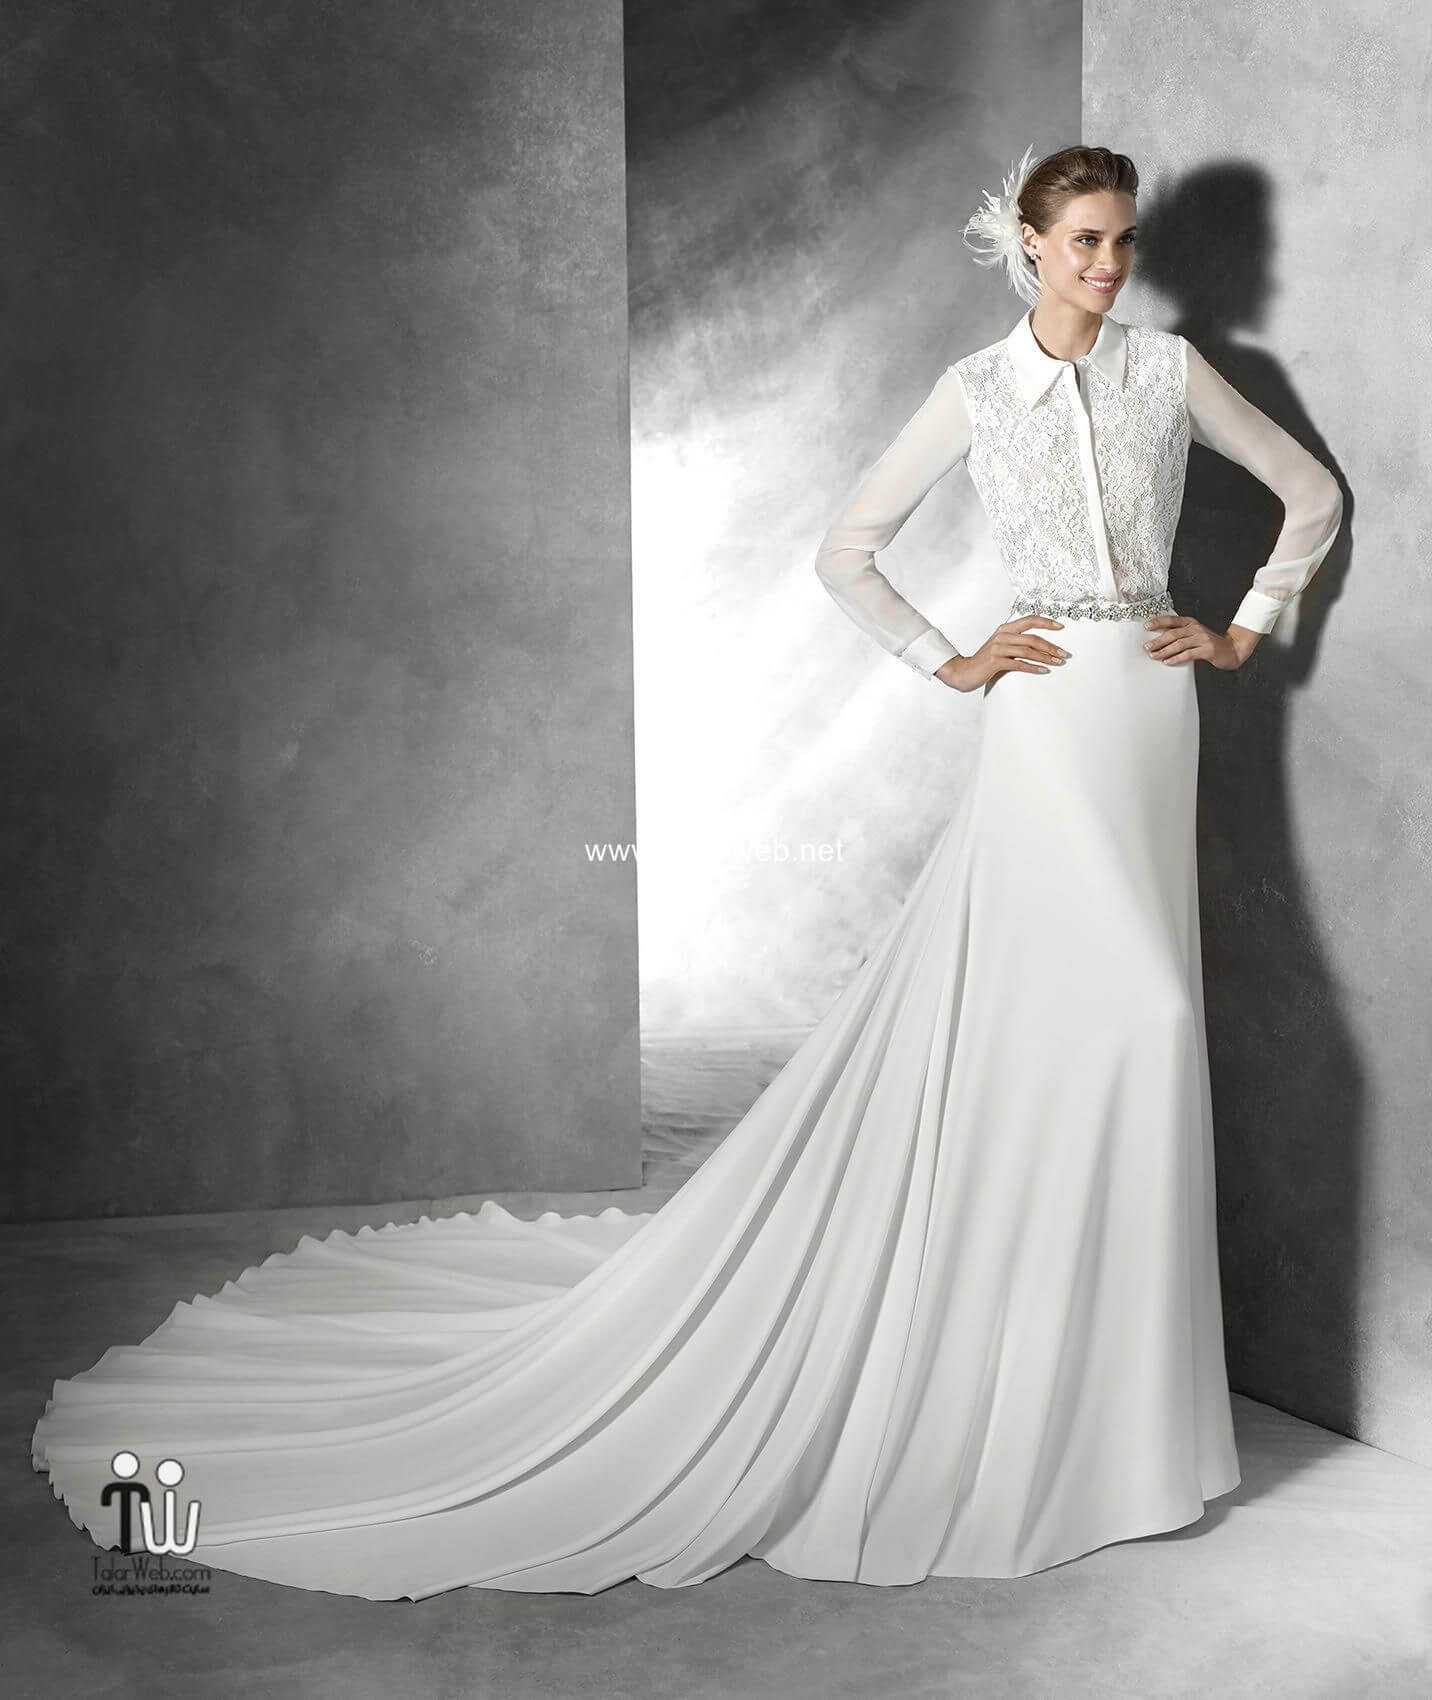 Wedding dresses bridal 2016 12 - مدل لباس عروس ۲۰۱۶ - سری۱